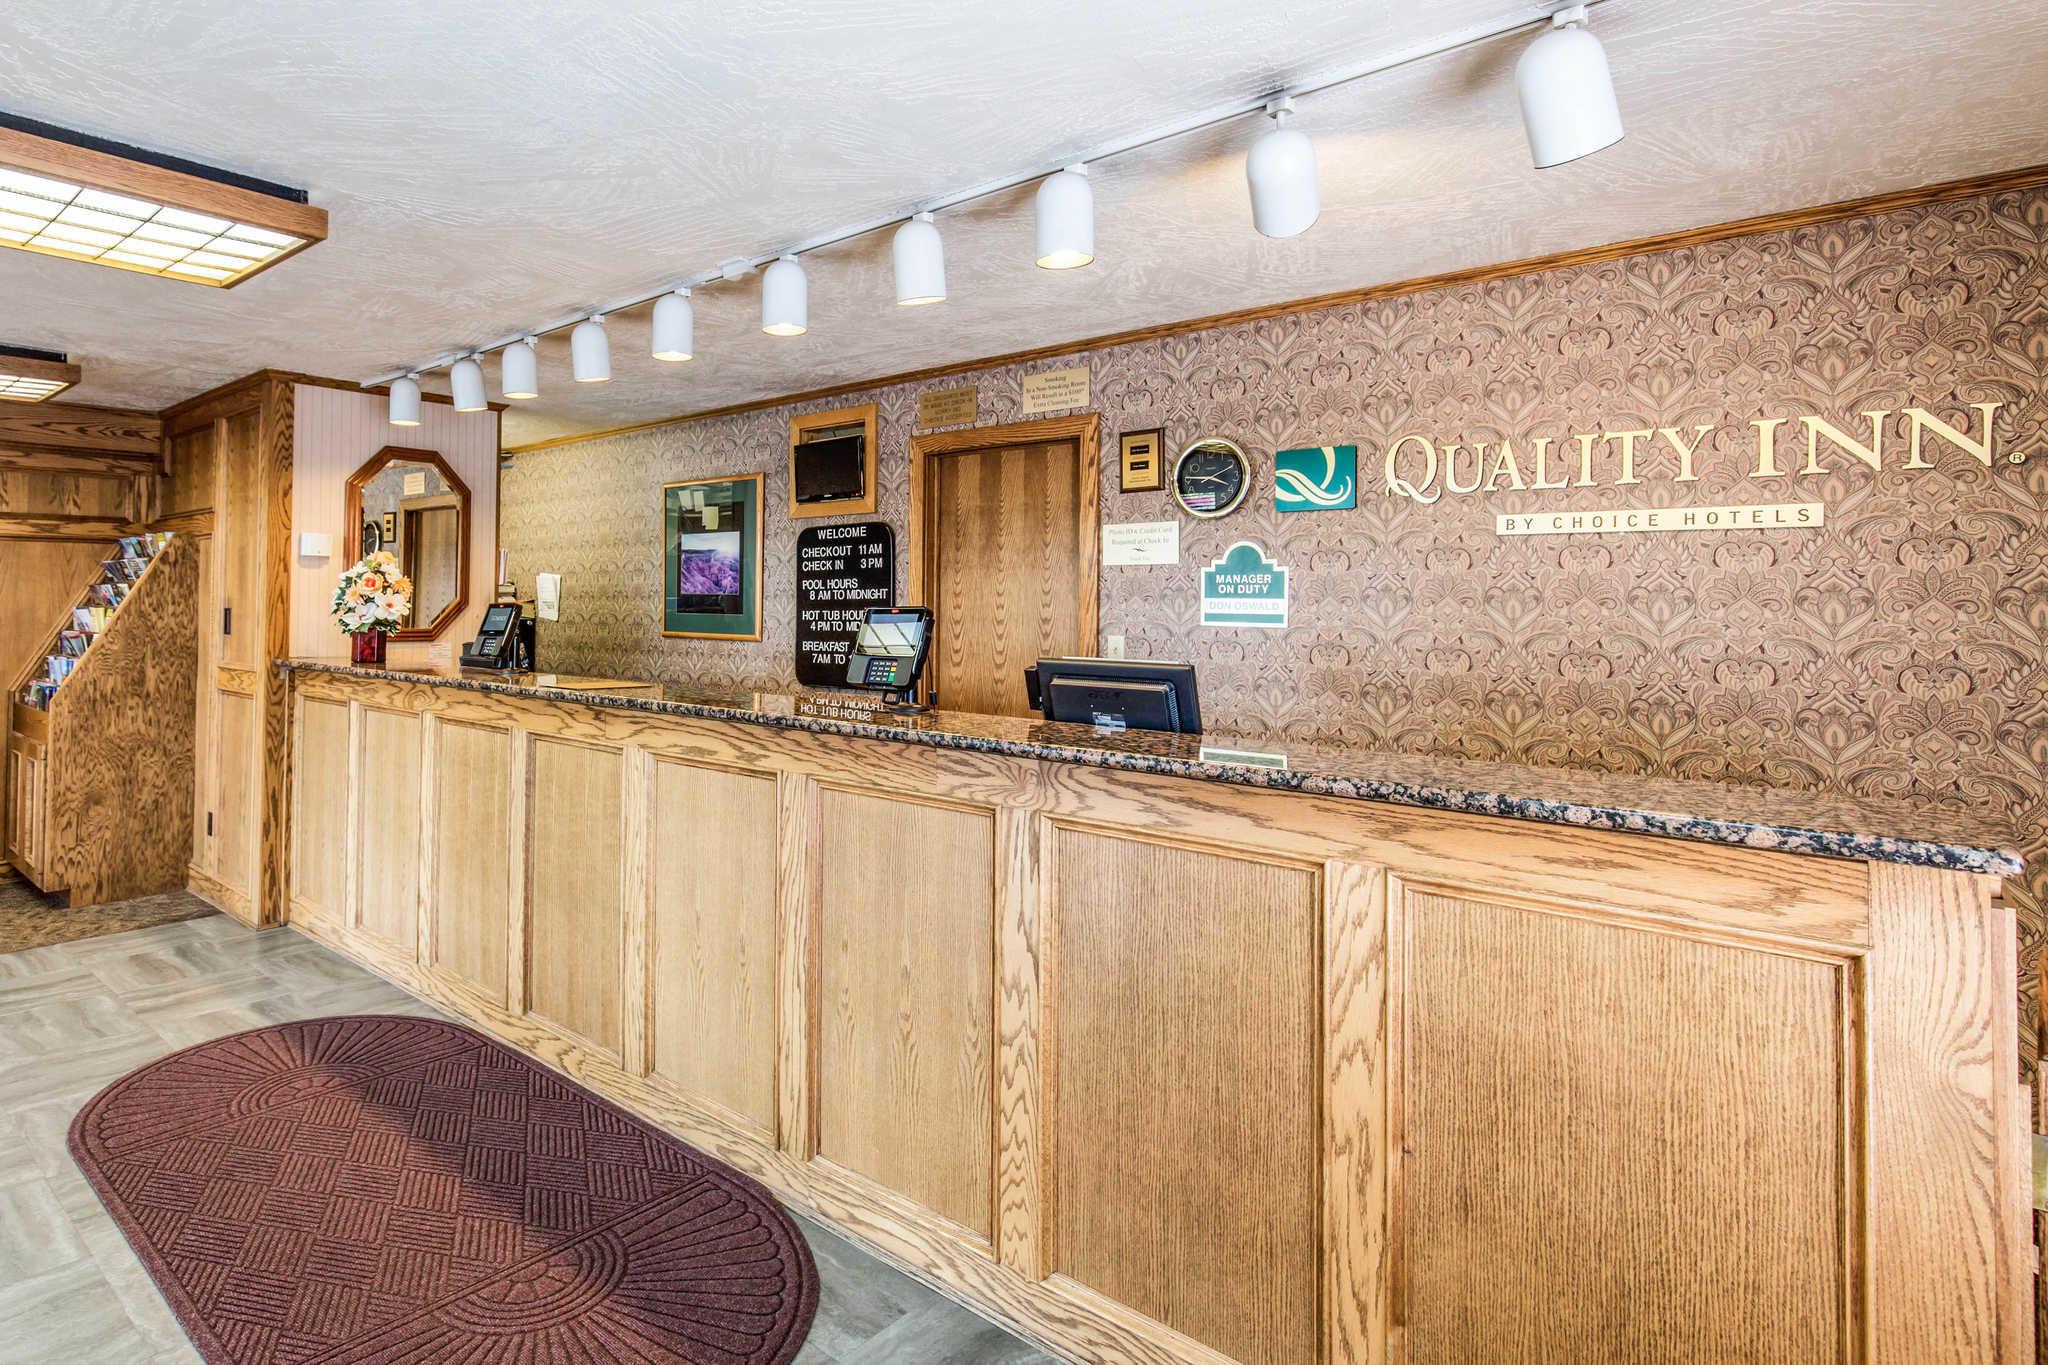 Quality Inn image 3